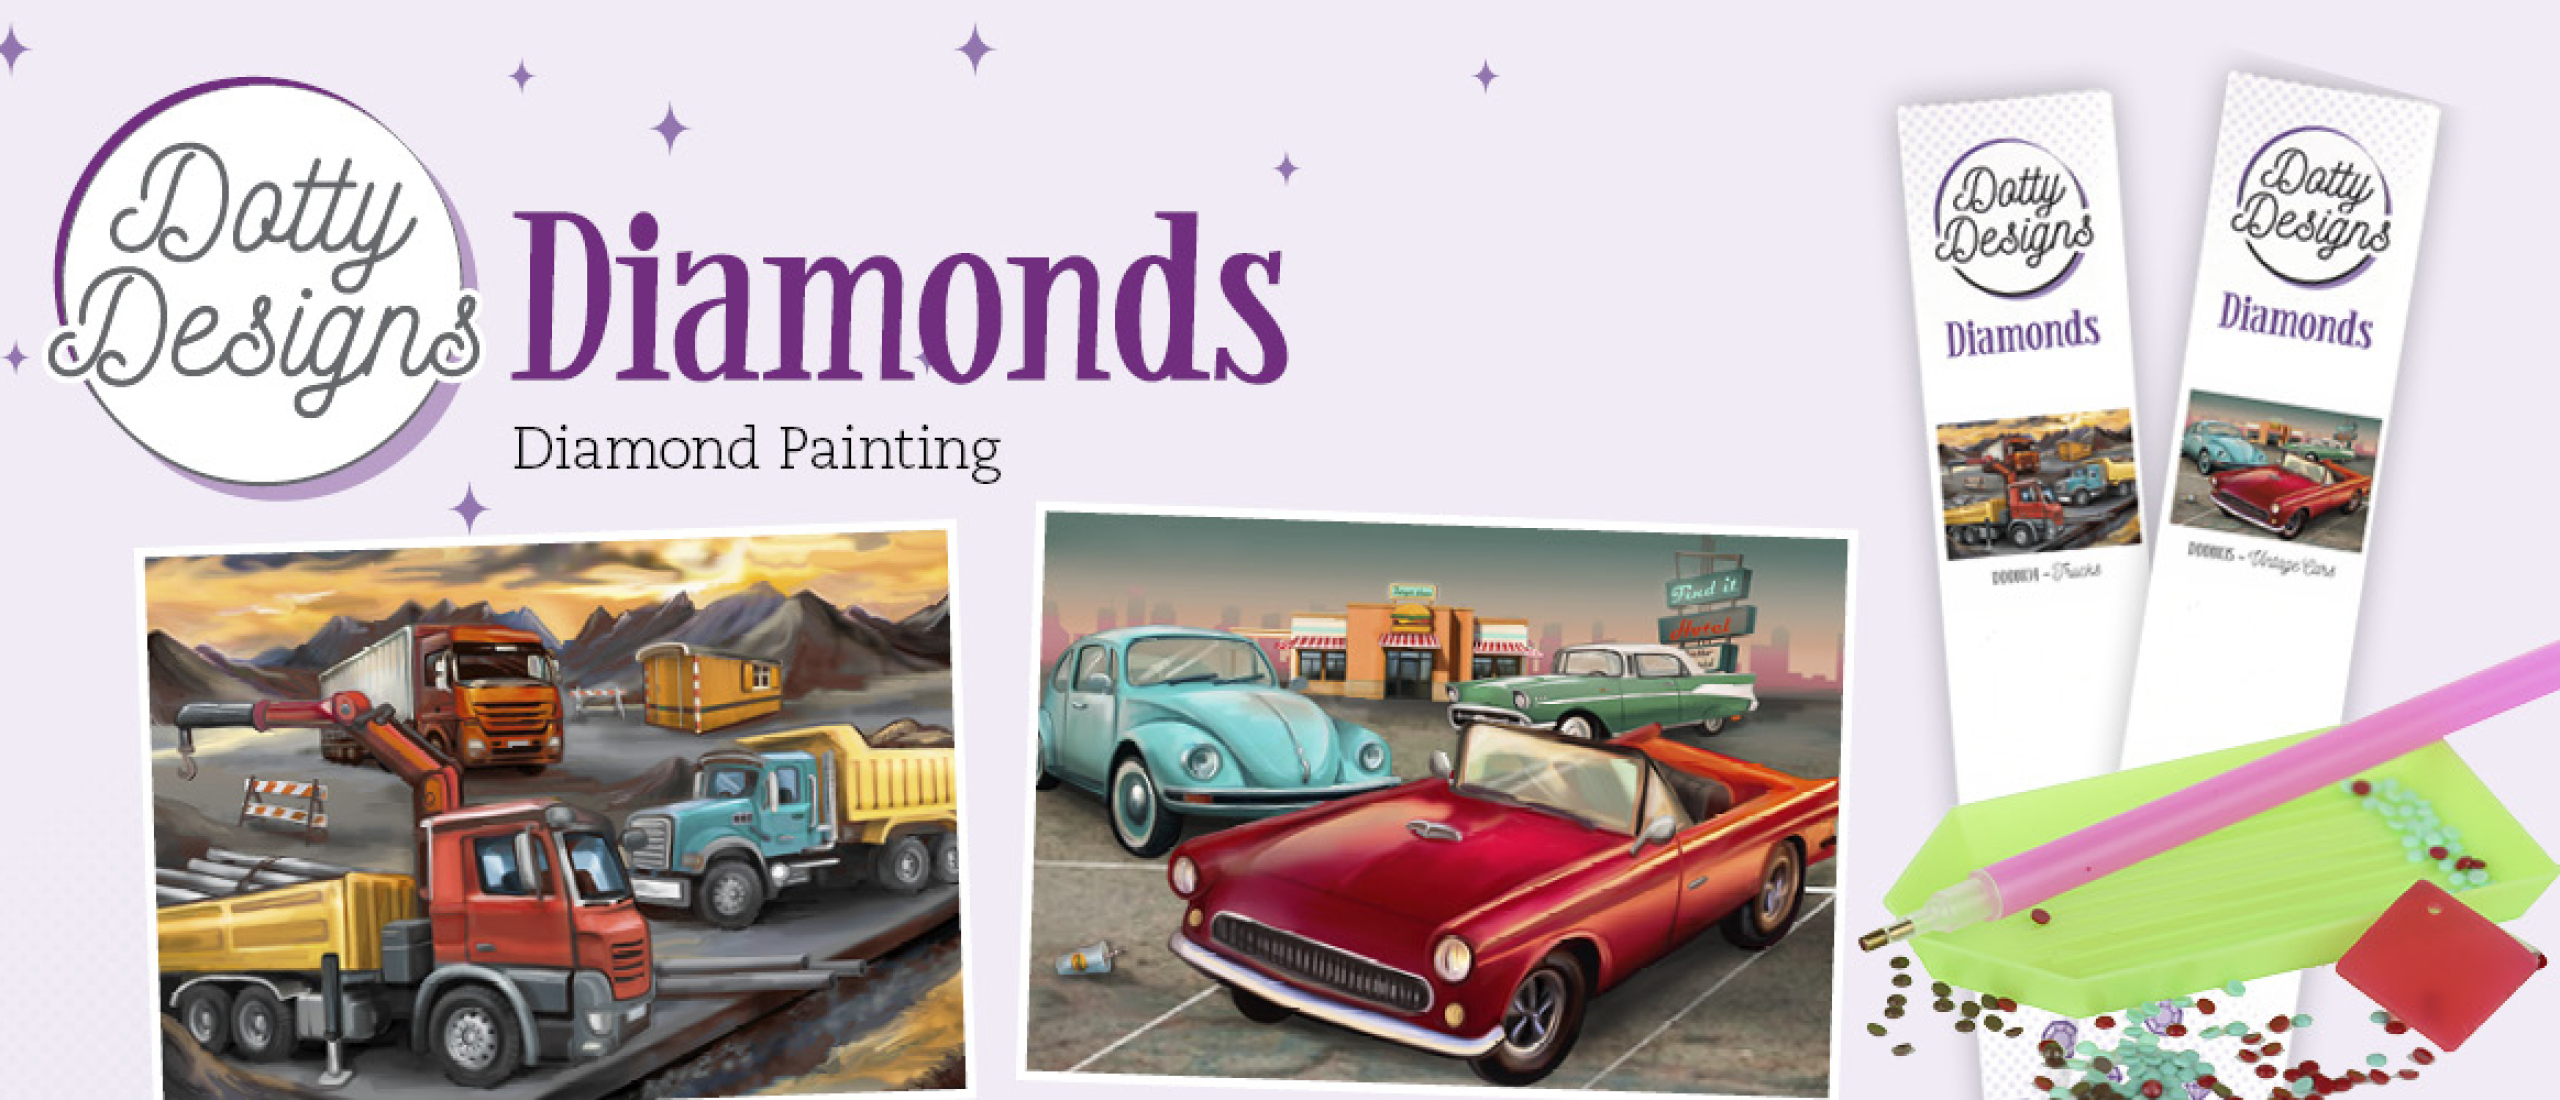 Dotty Designs Diamonds Vintage Cars en Trucks